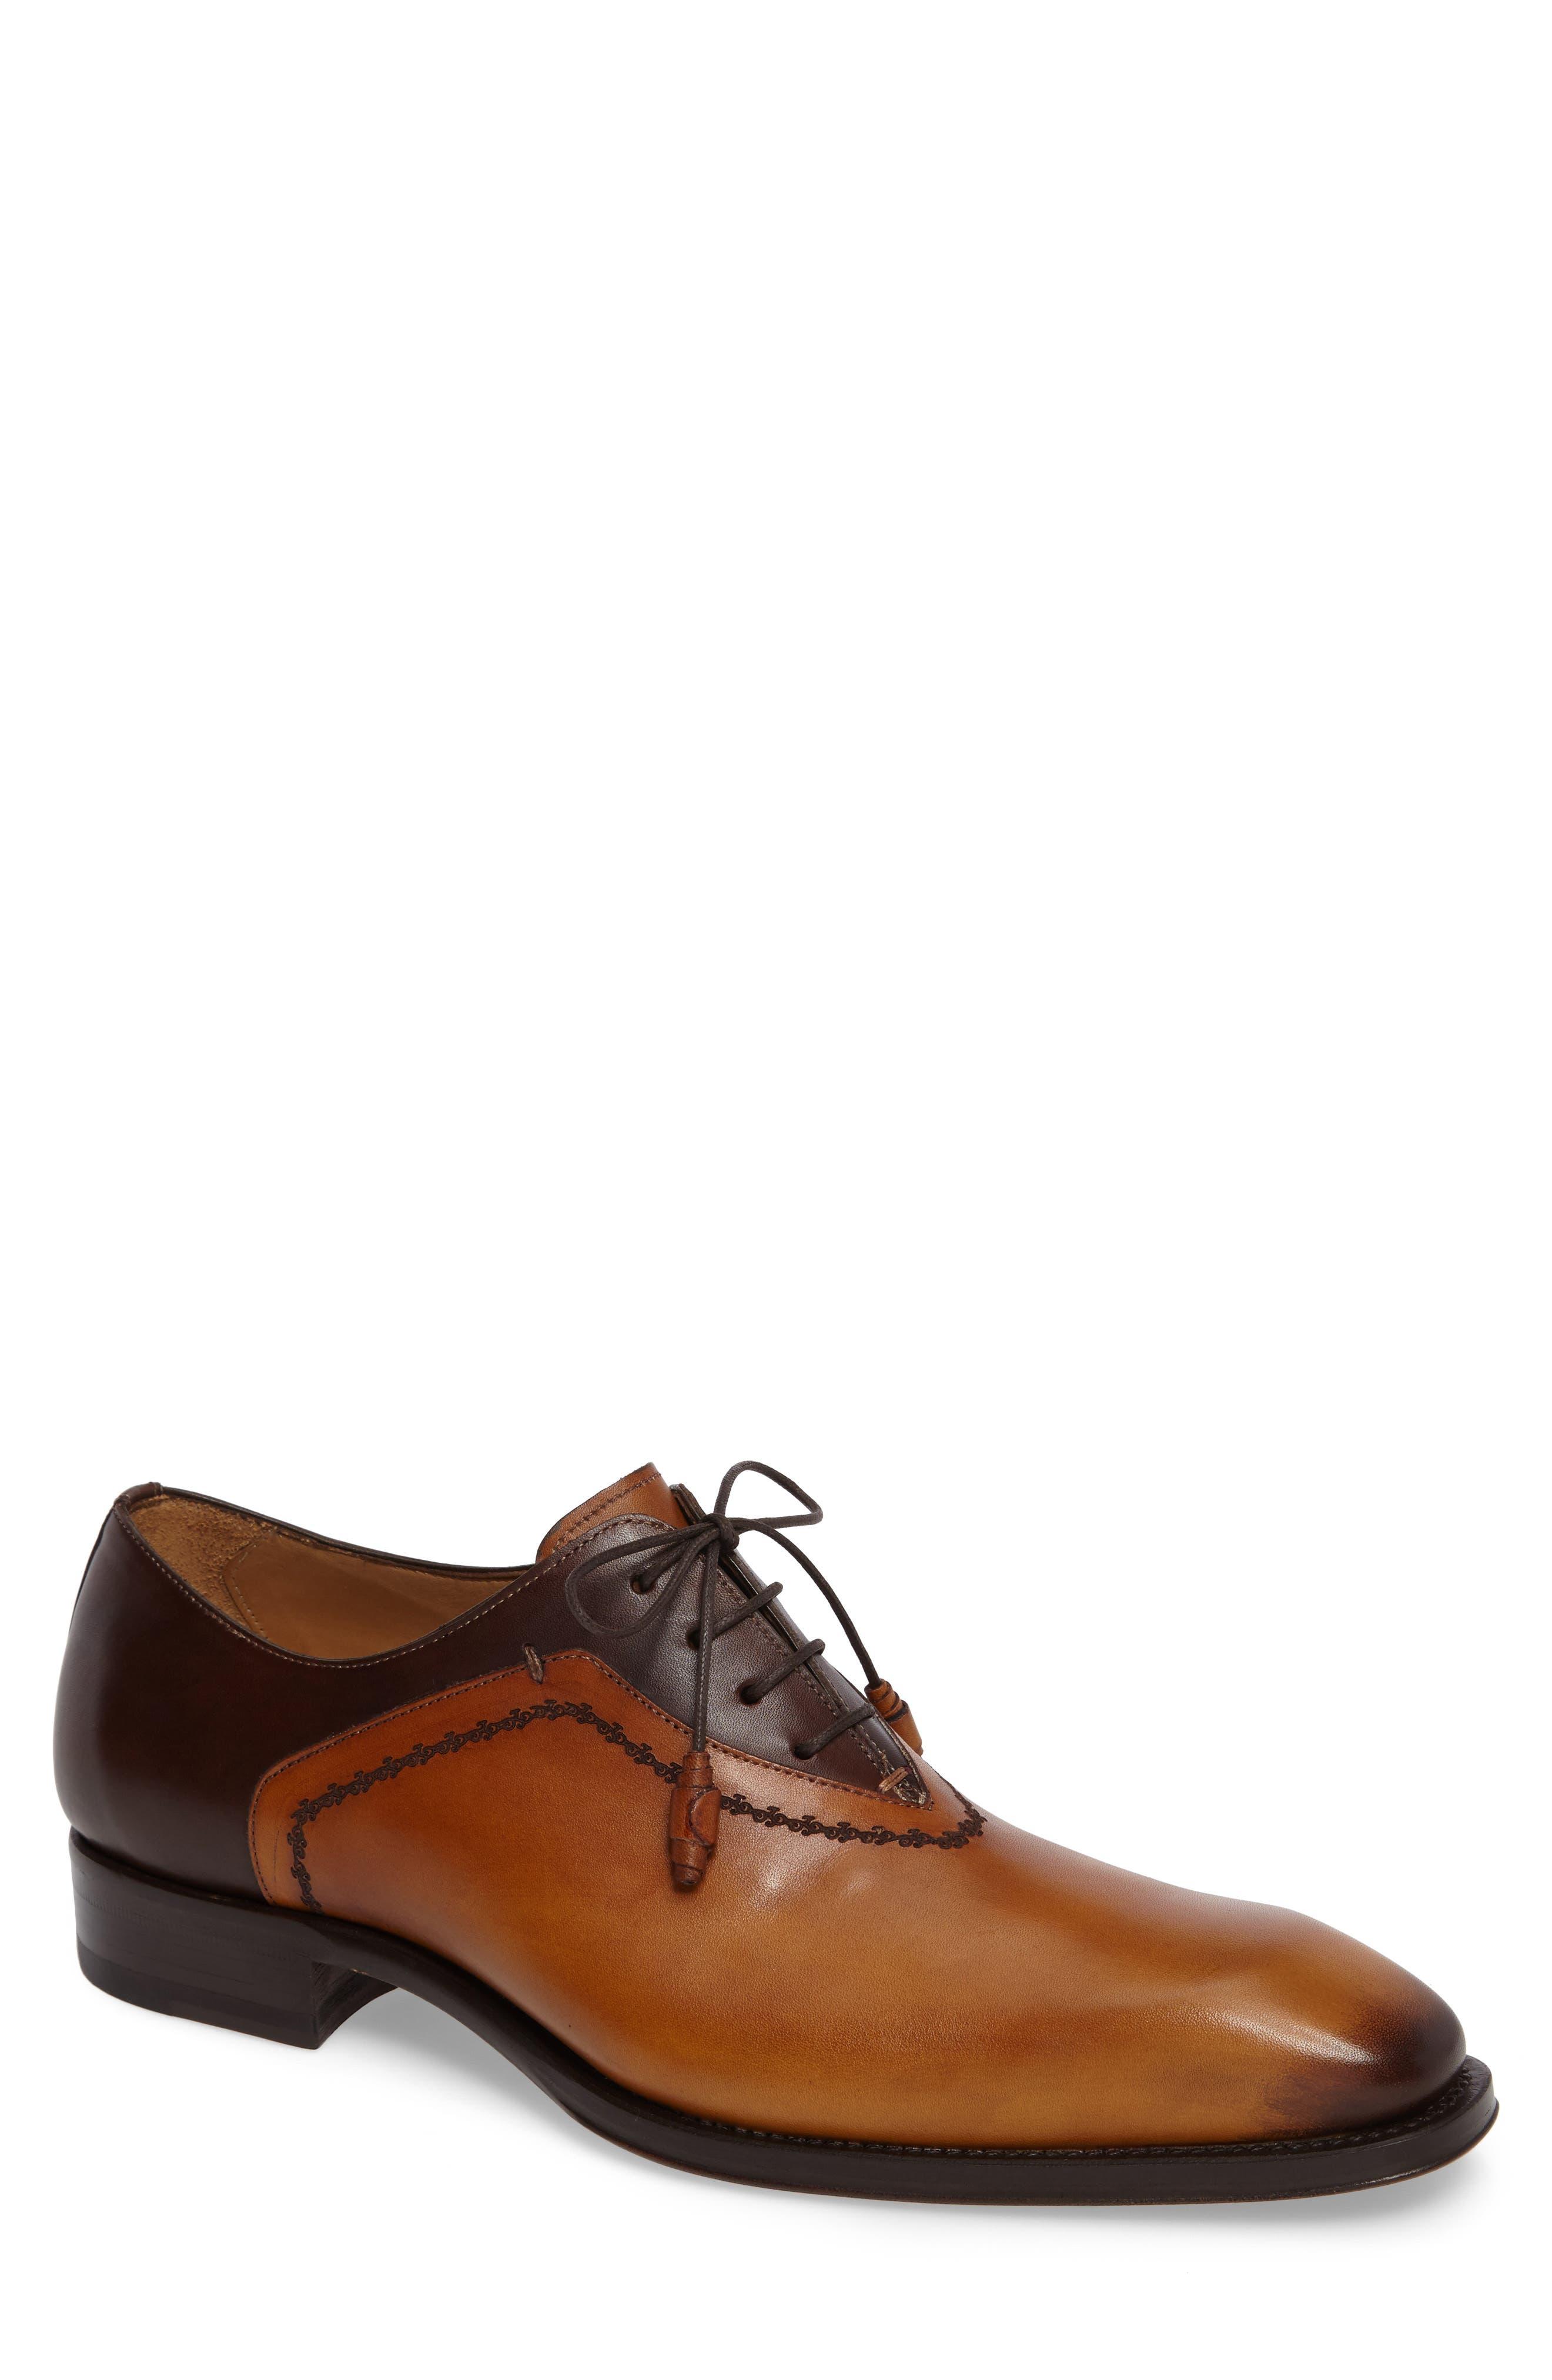 Alternate Image 1 Selected - Mezlan Manet Plain-Toe Oxford (Men)